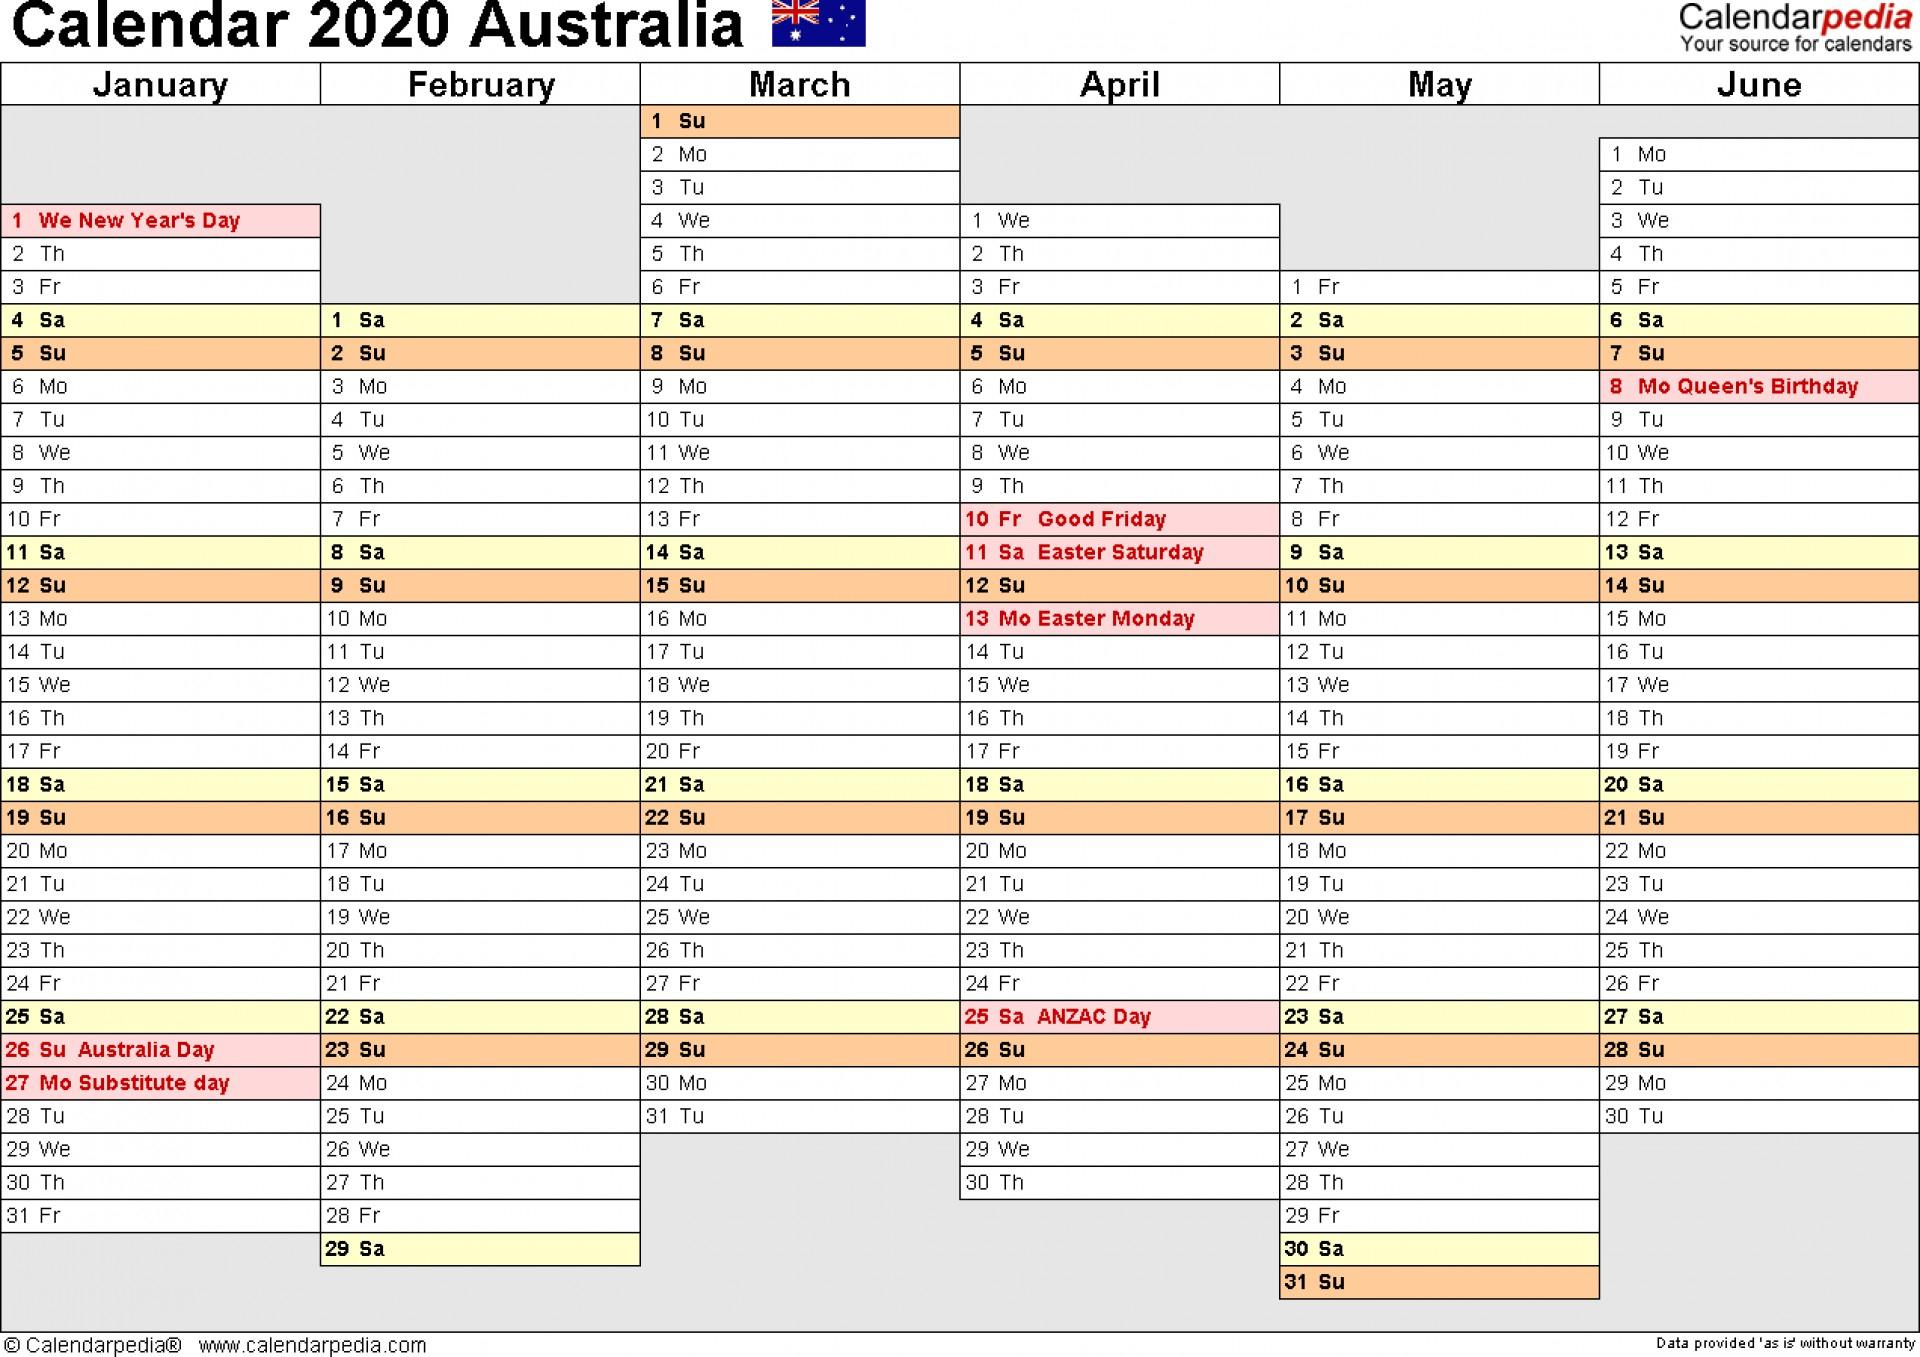 036 Year Planner Australia Calendar Template Google Sheets